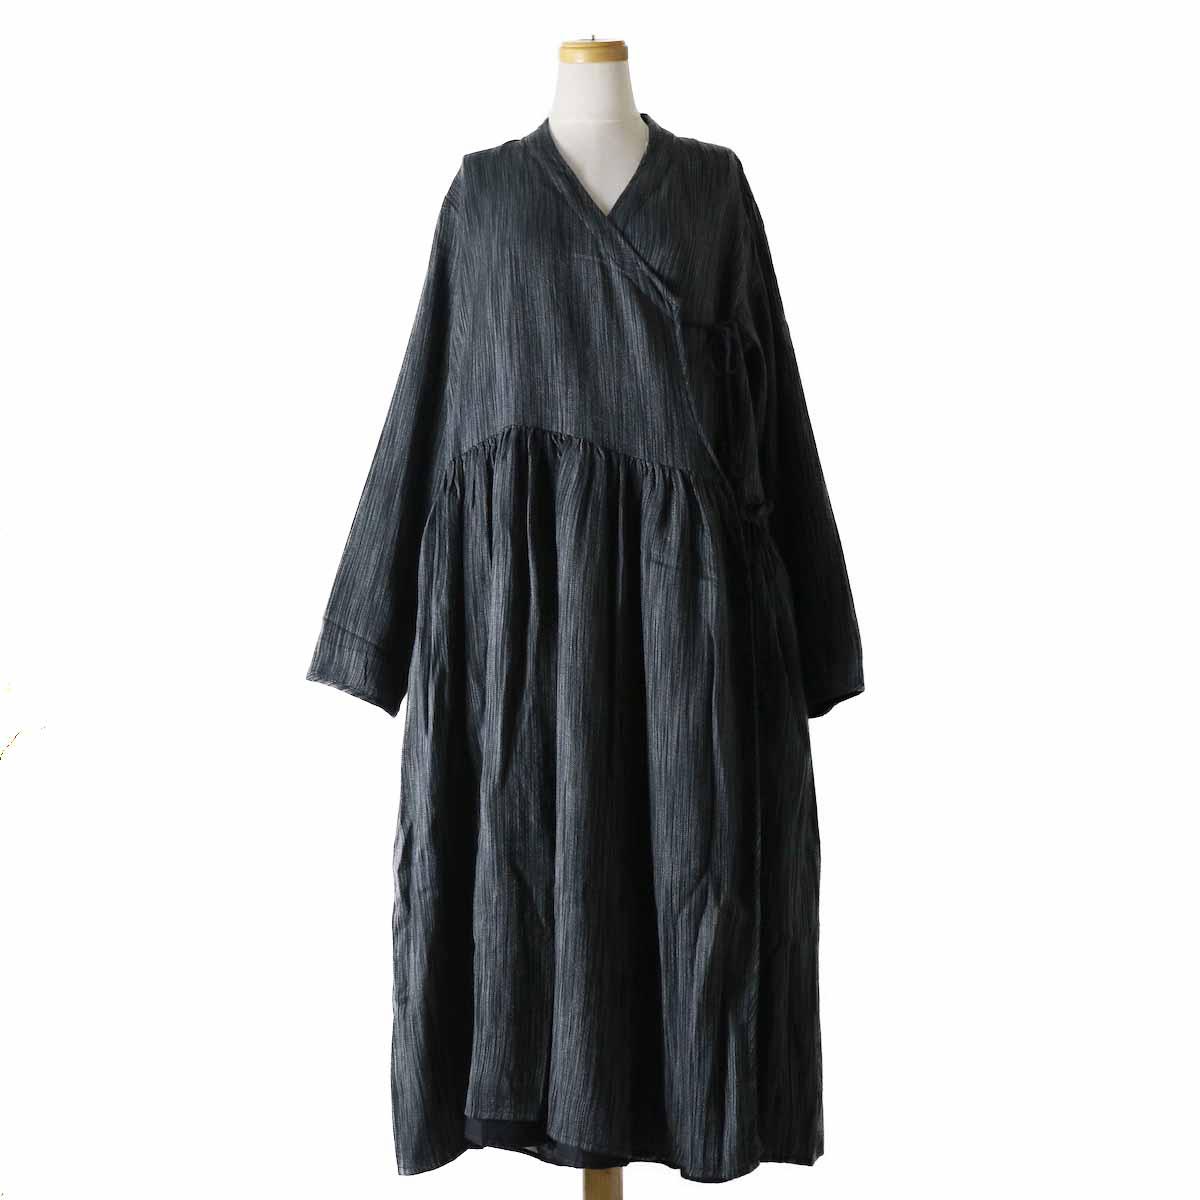 maison de soil / INMDS18642 WOOL REVERSIBLE GATHERED DRESS -BLACK×GRAY